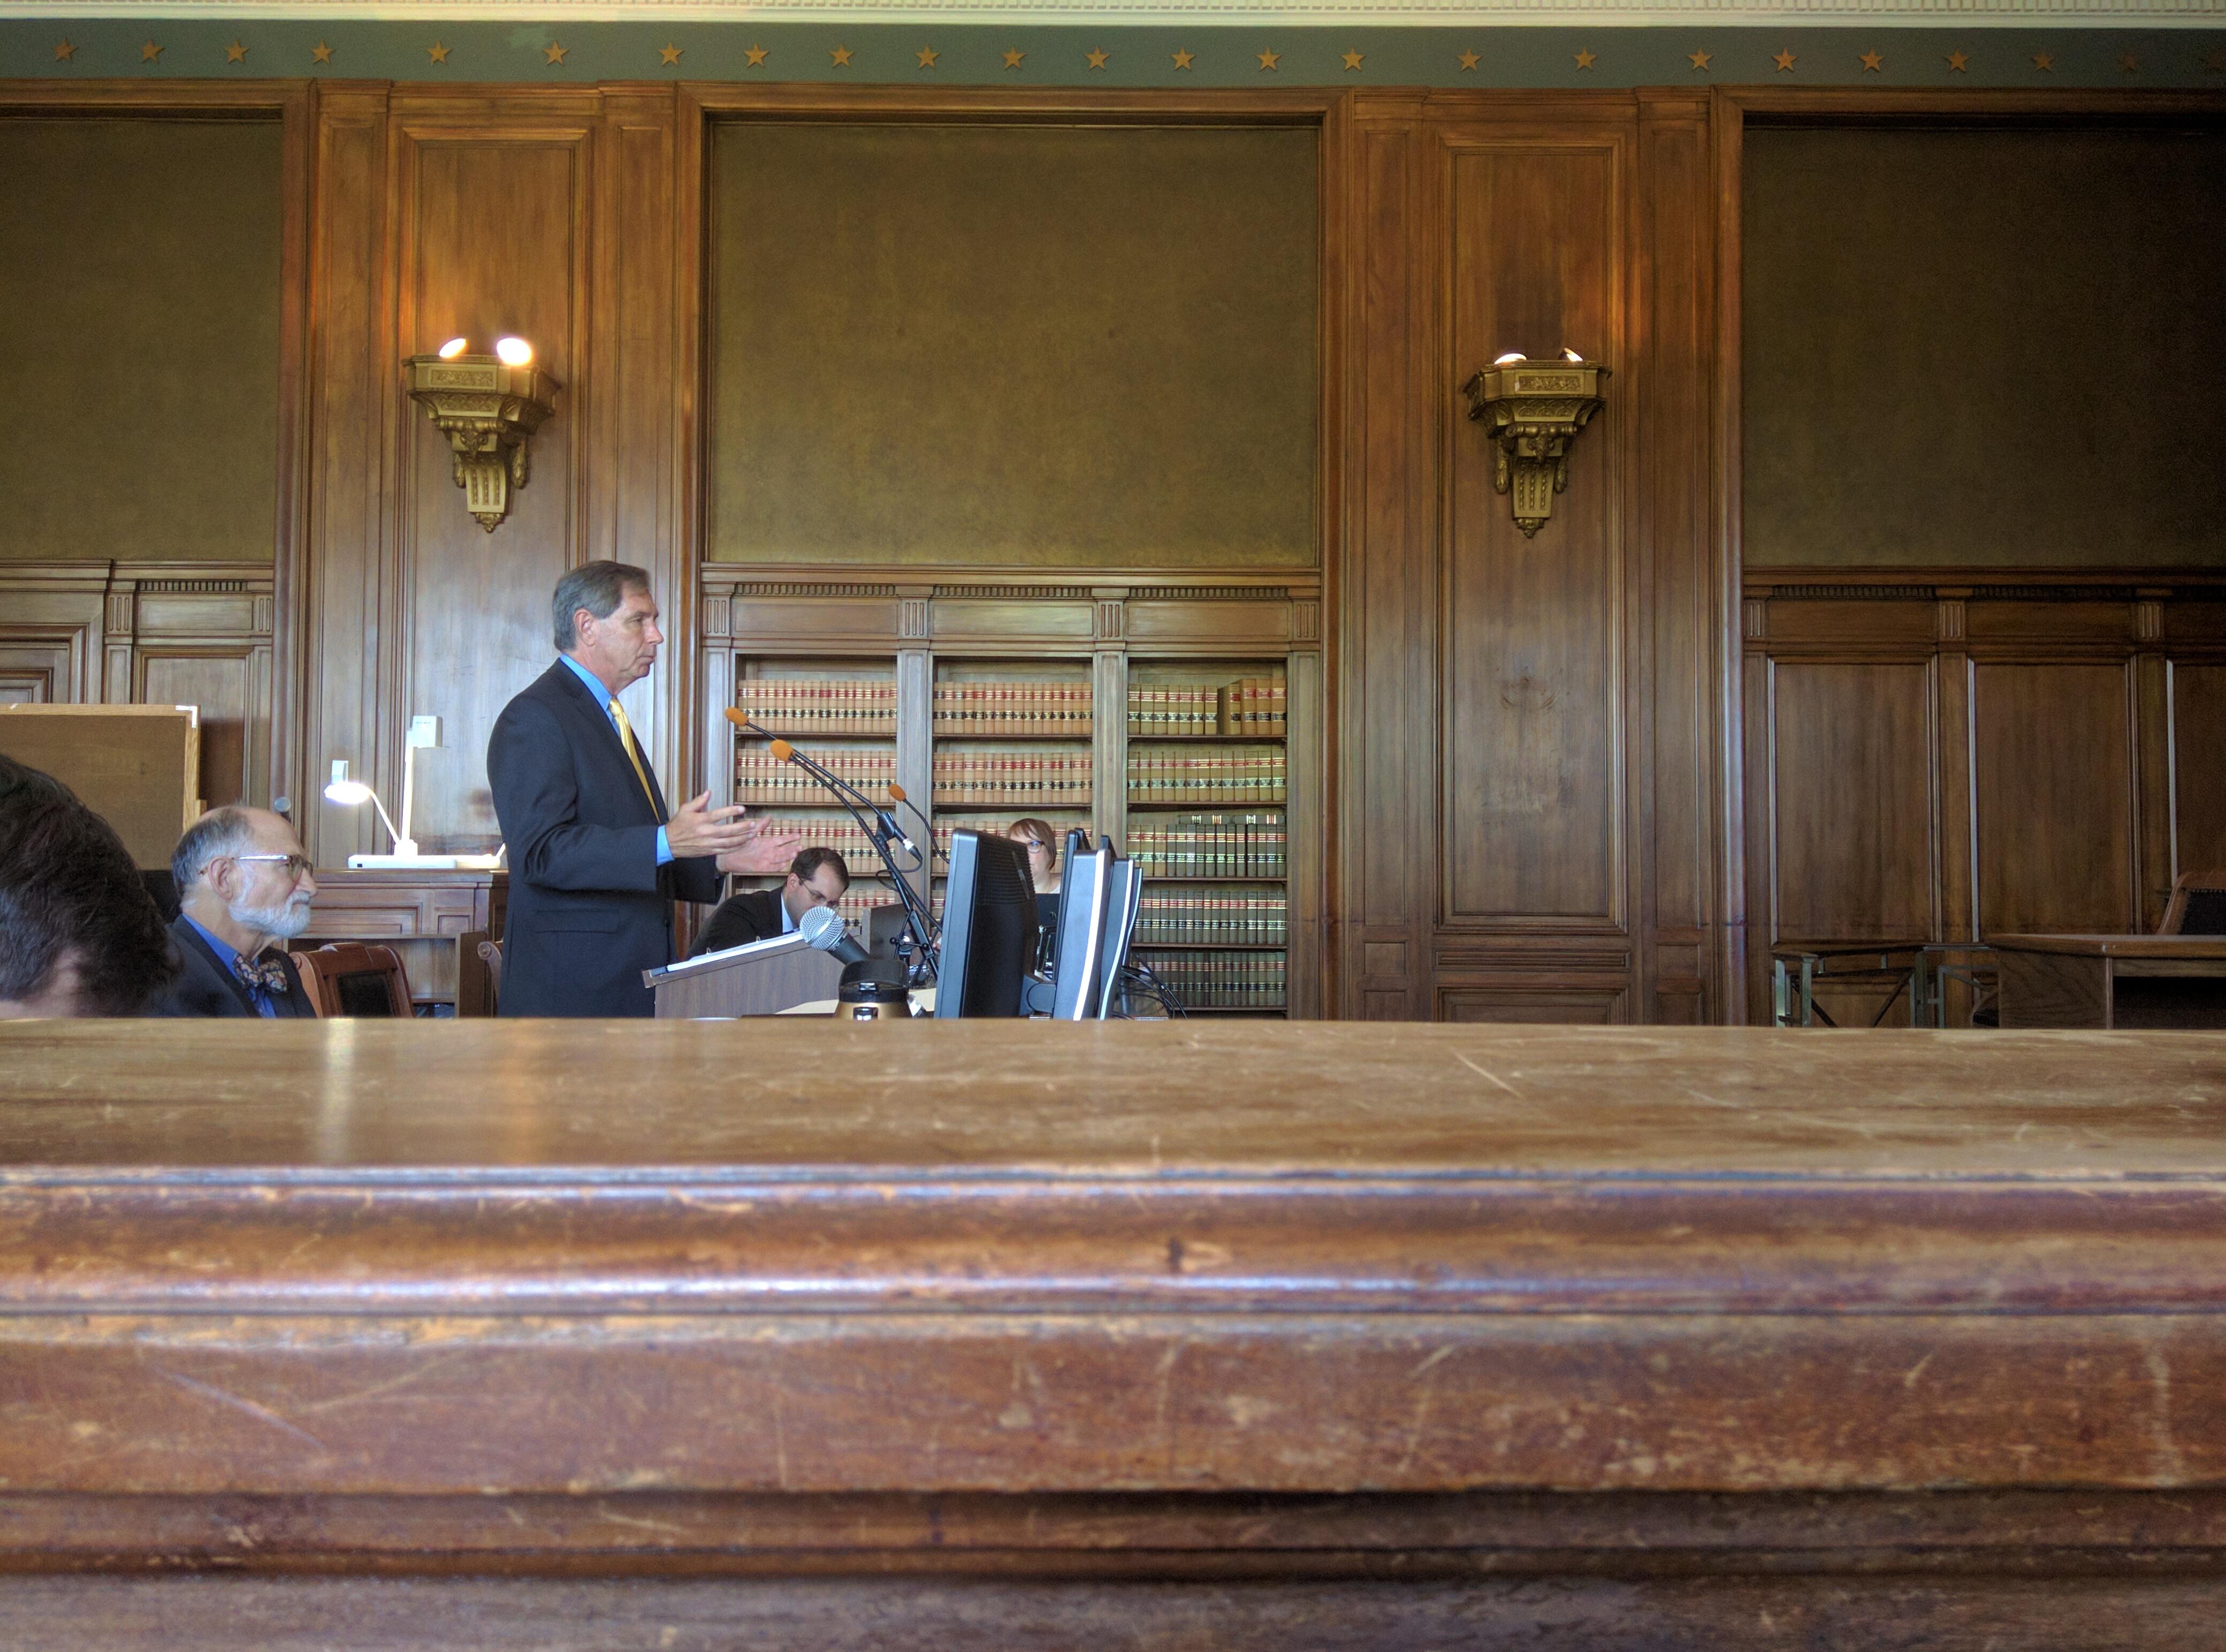 Joseph Moodhe, the plaintiff's attorney